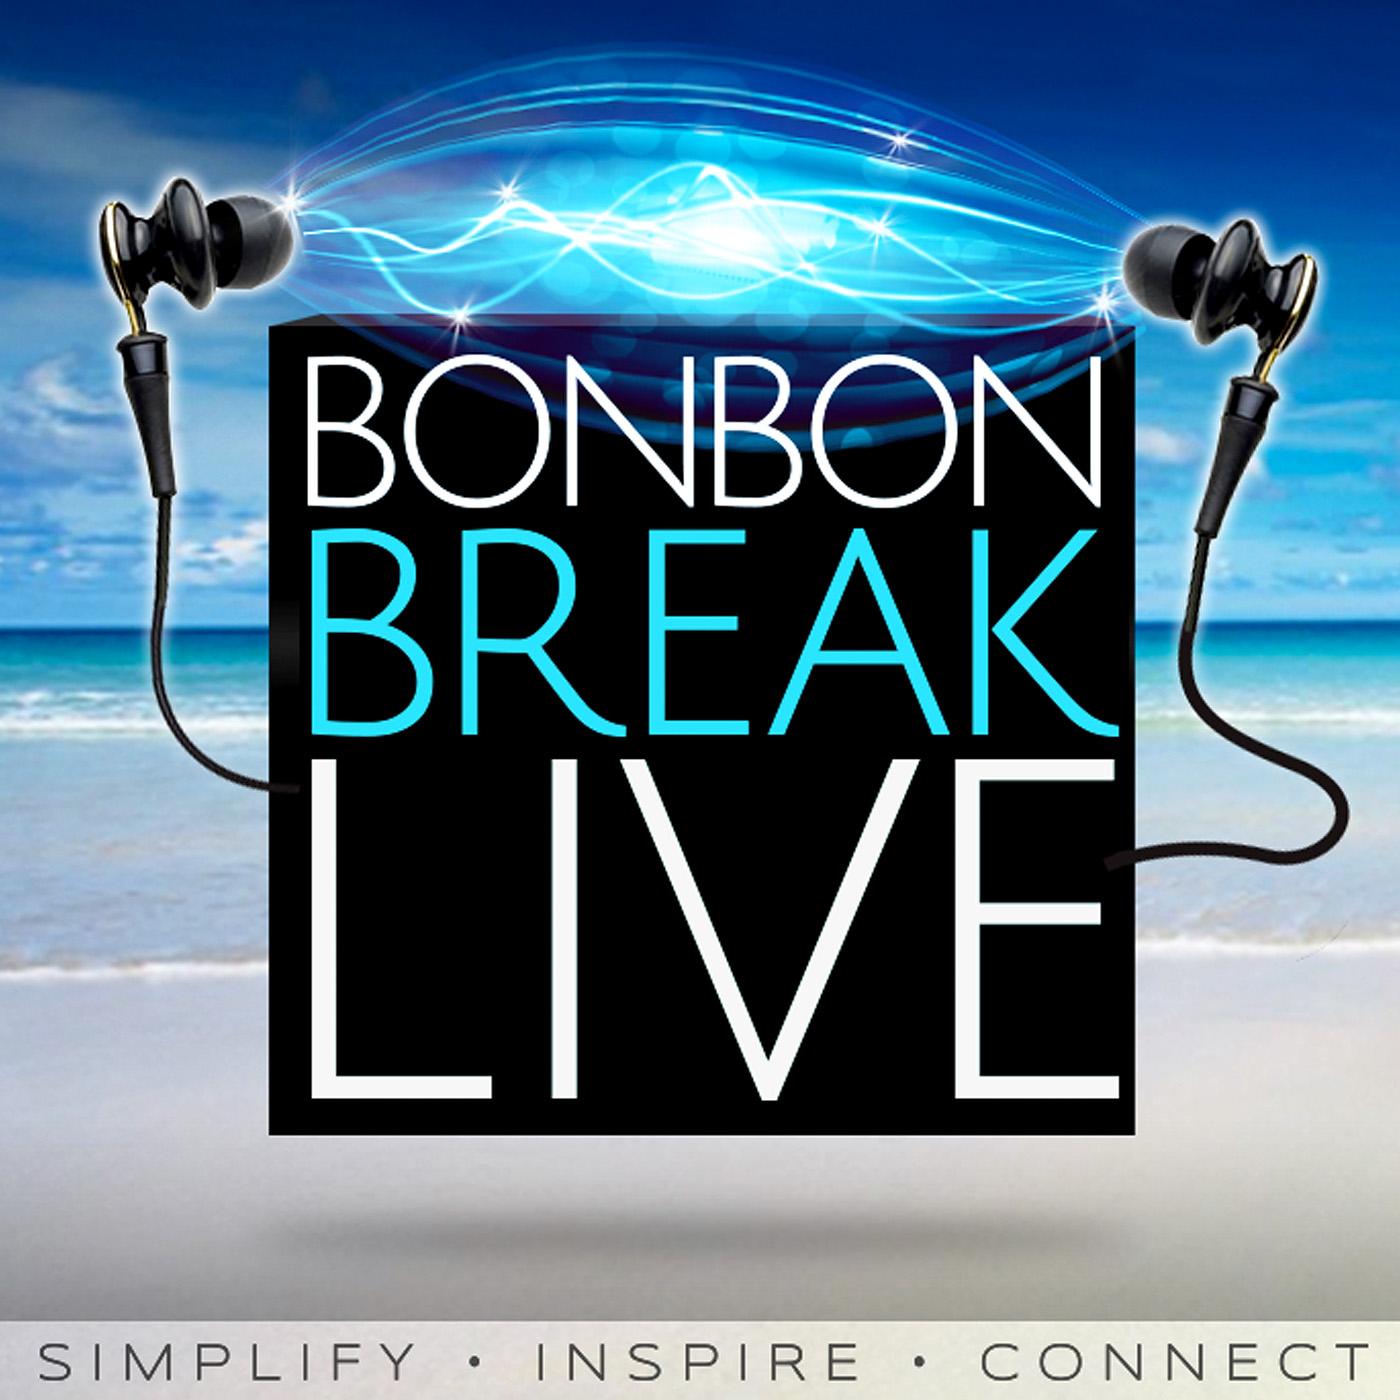 BonBon Break LIVE Podcast logo